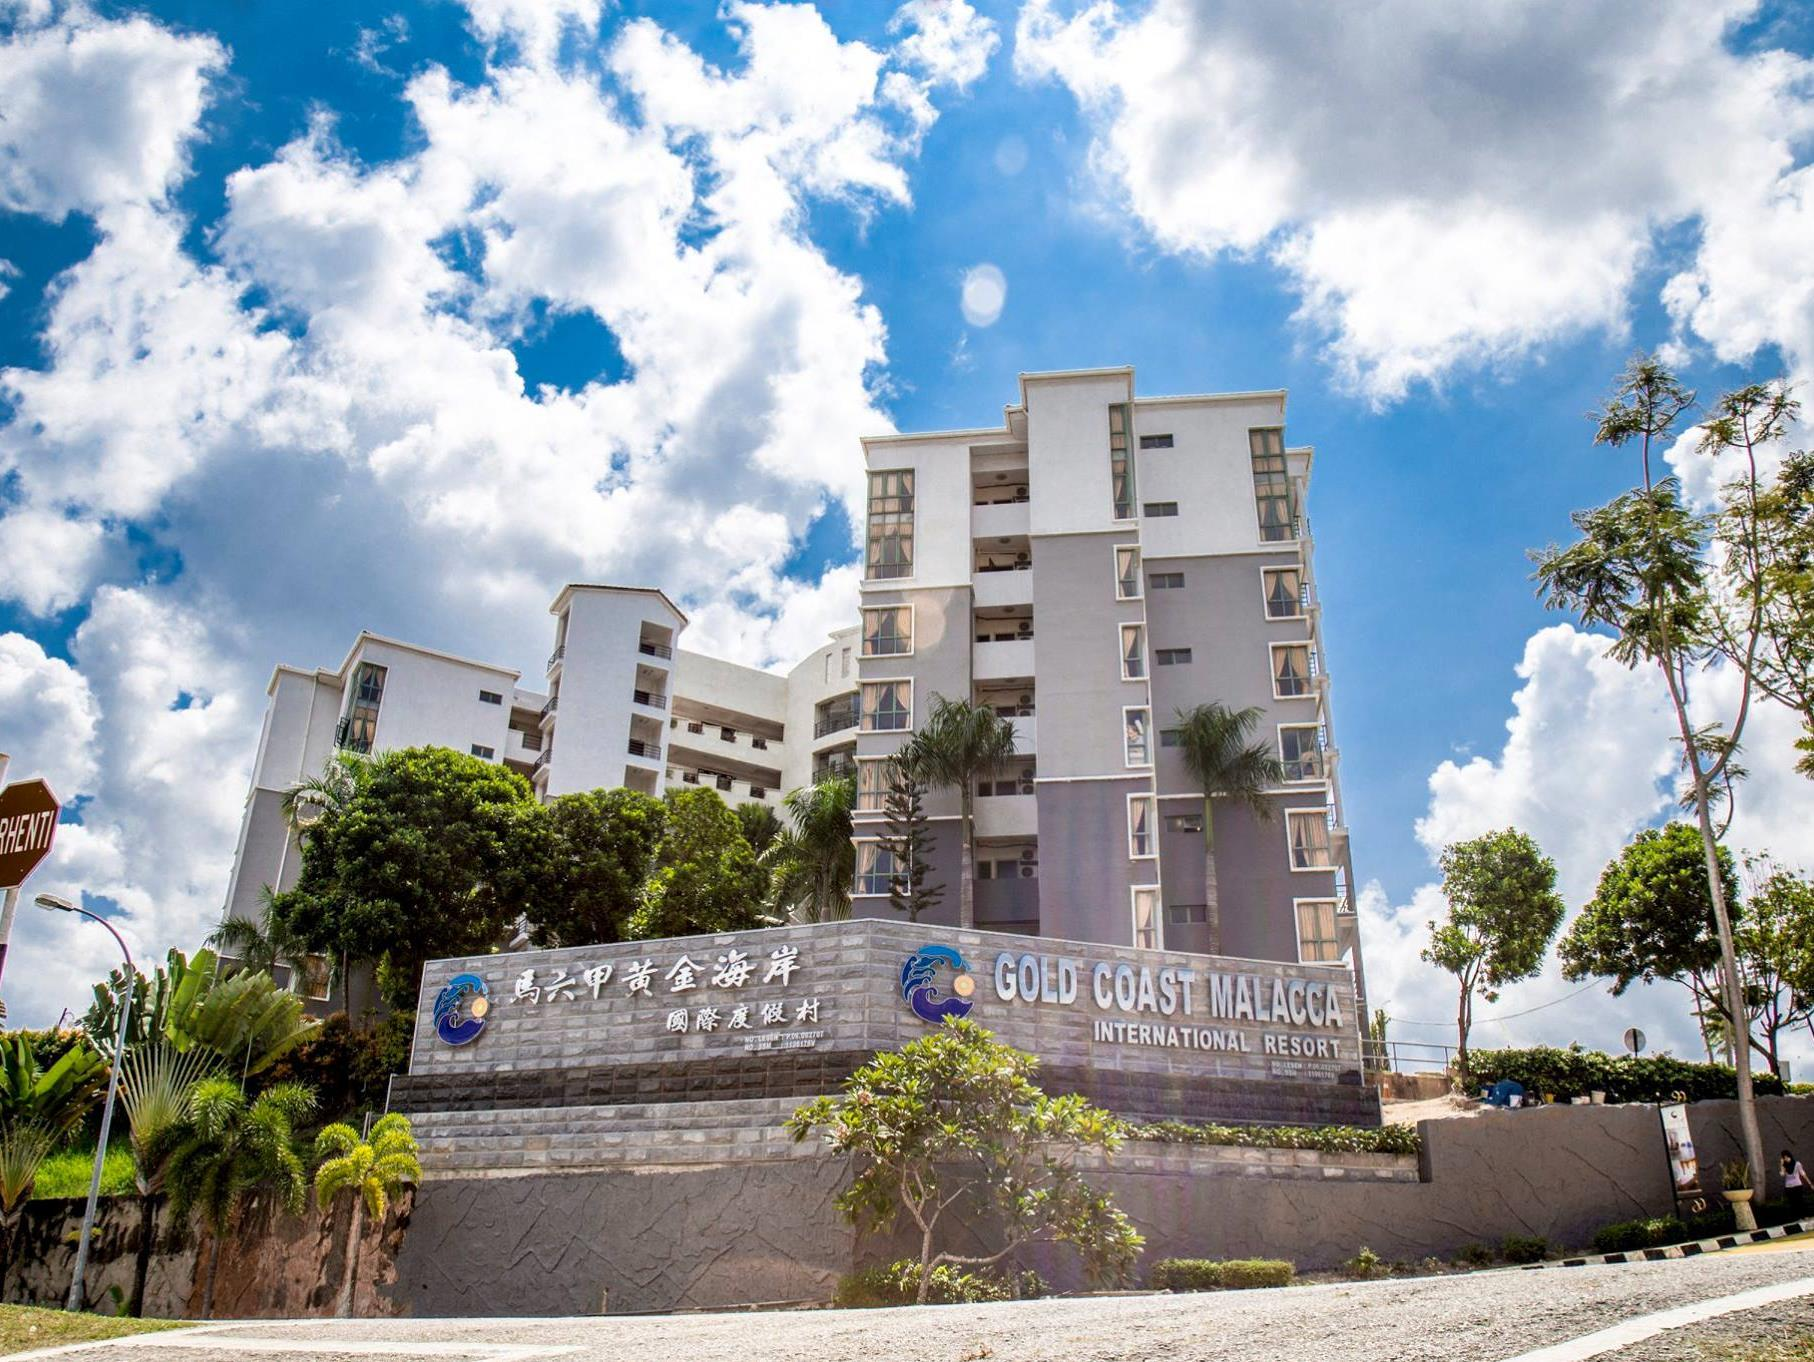 Gold Coast Malacca International Resort - Hotels and Accommodation in Malaysia, Asia